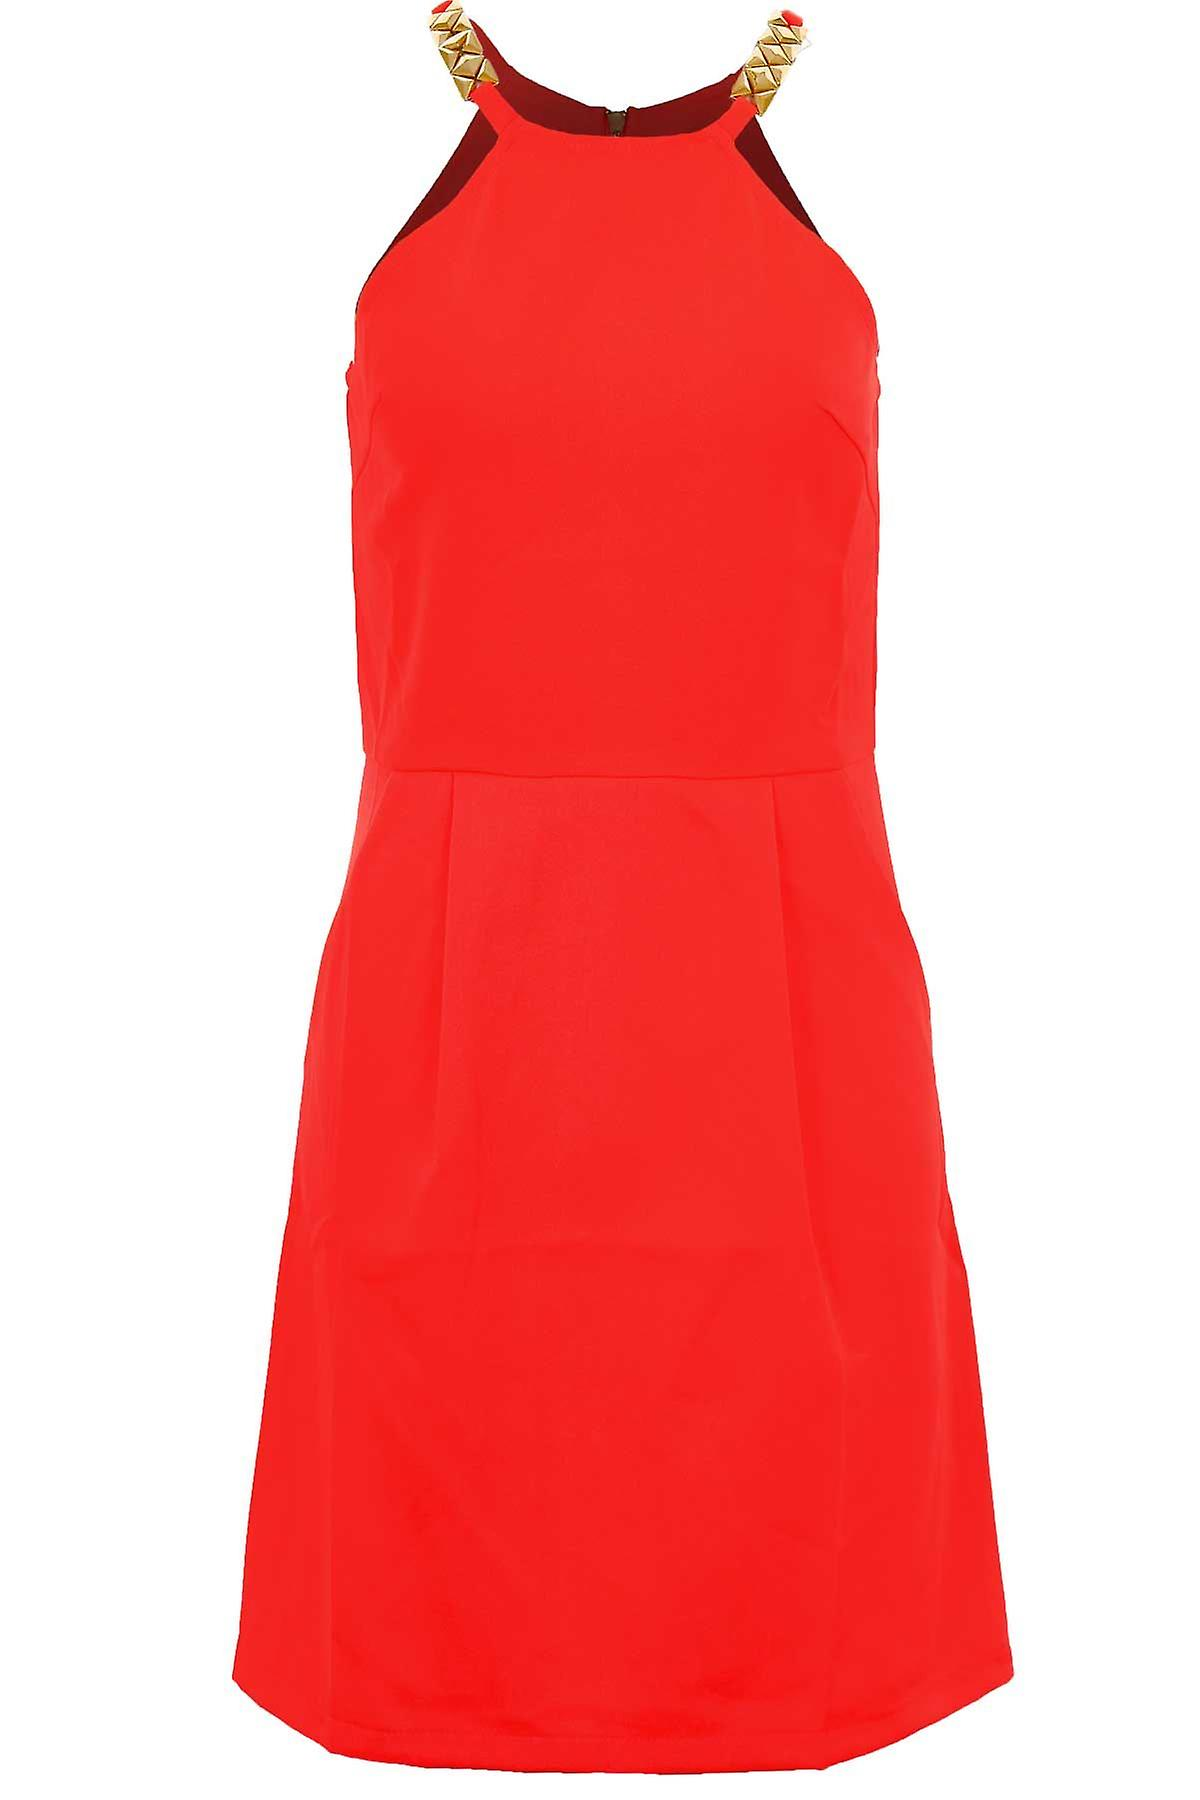 Ladies Sleeveless Studded Strap Zip Back Women's Smart Party Shift Dress